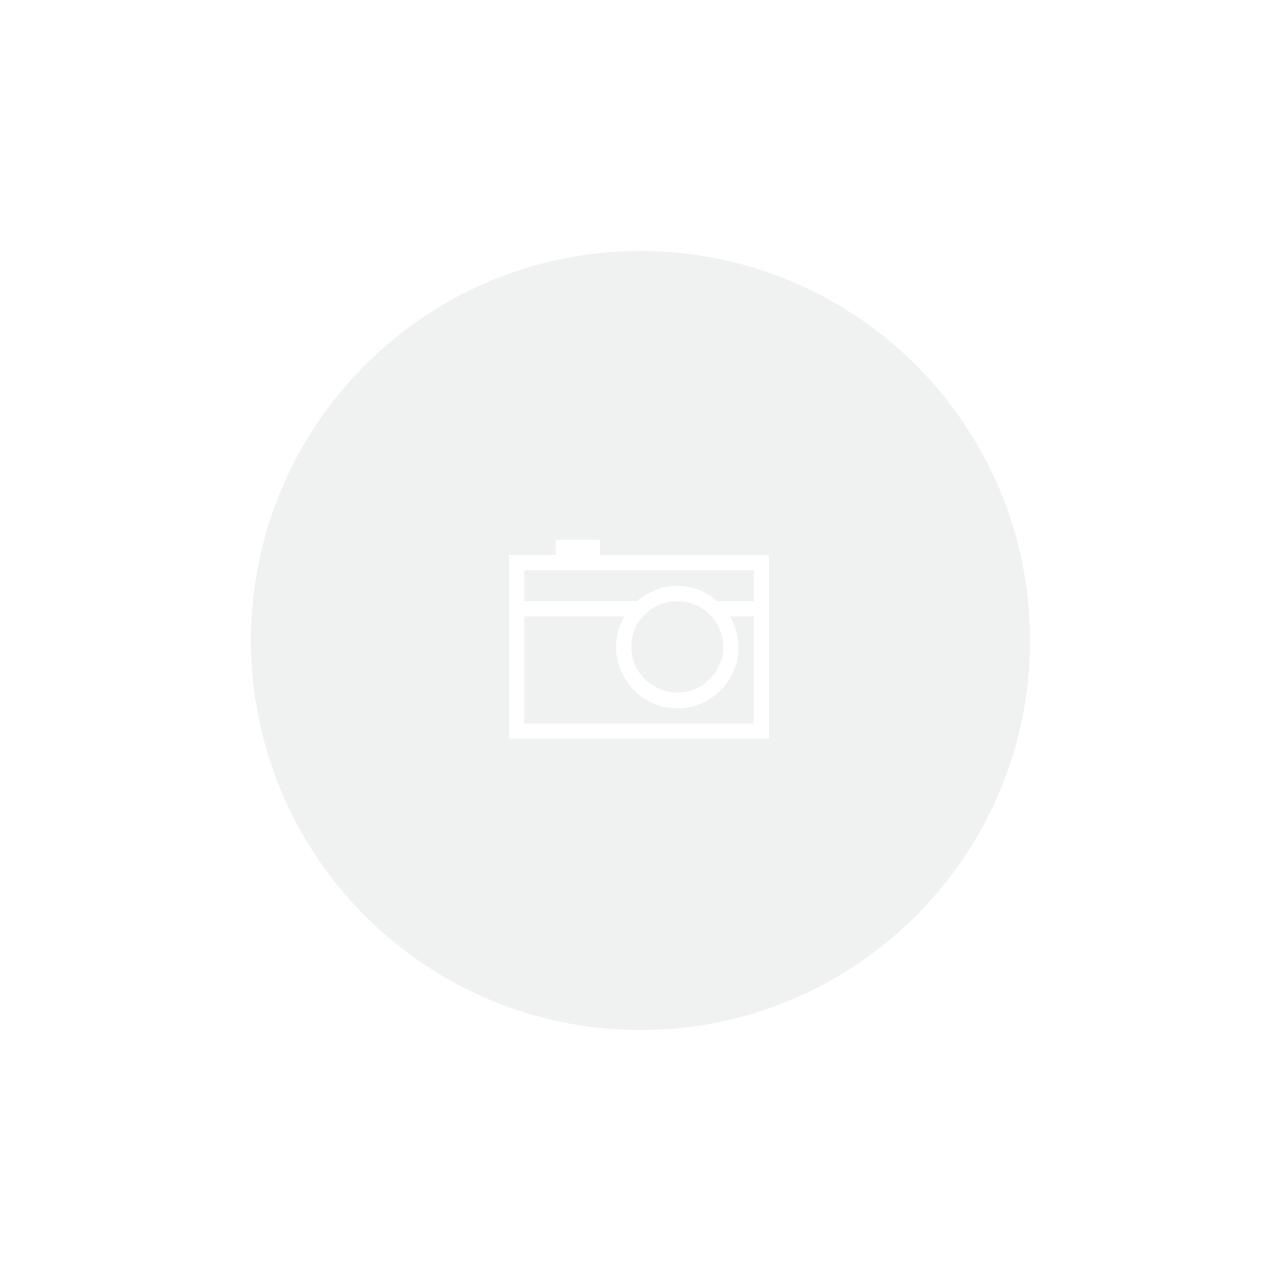 Panela Inox 20cm 2,80 Litros Duo Silicone Tramontina